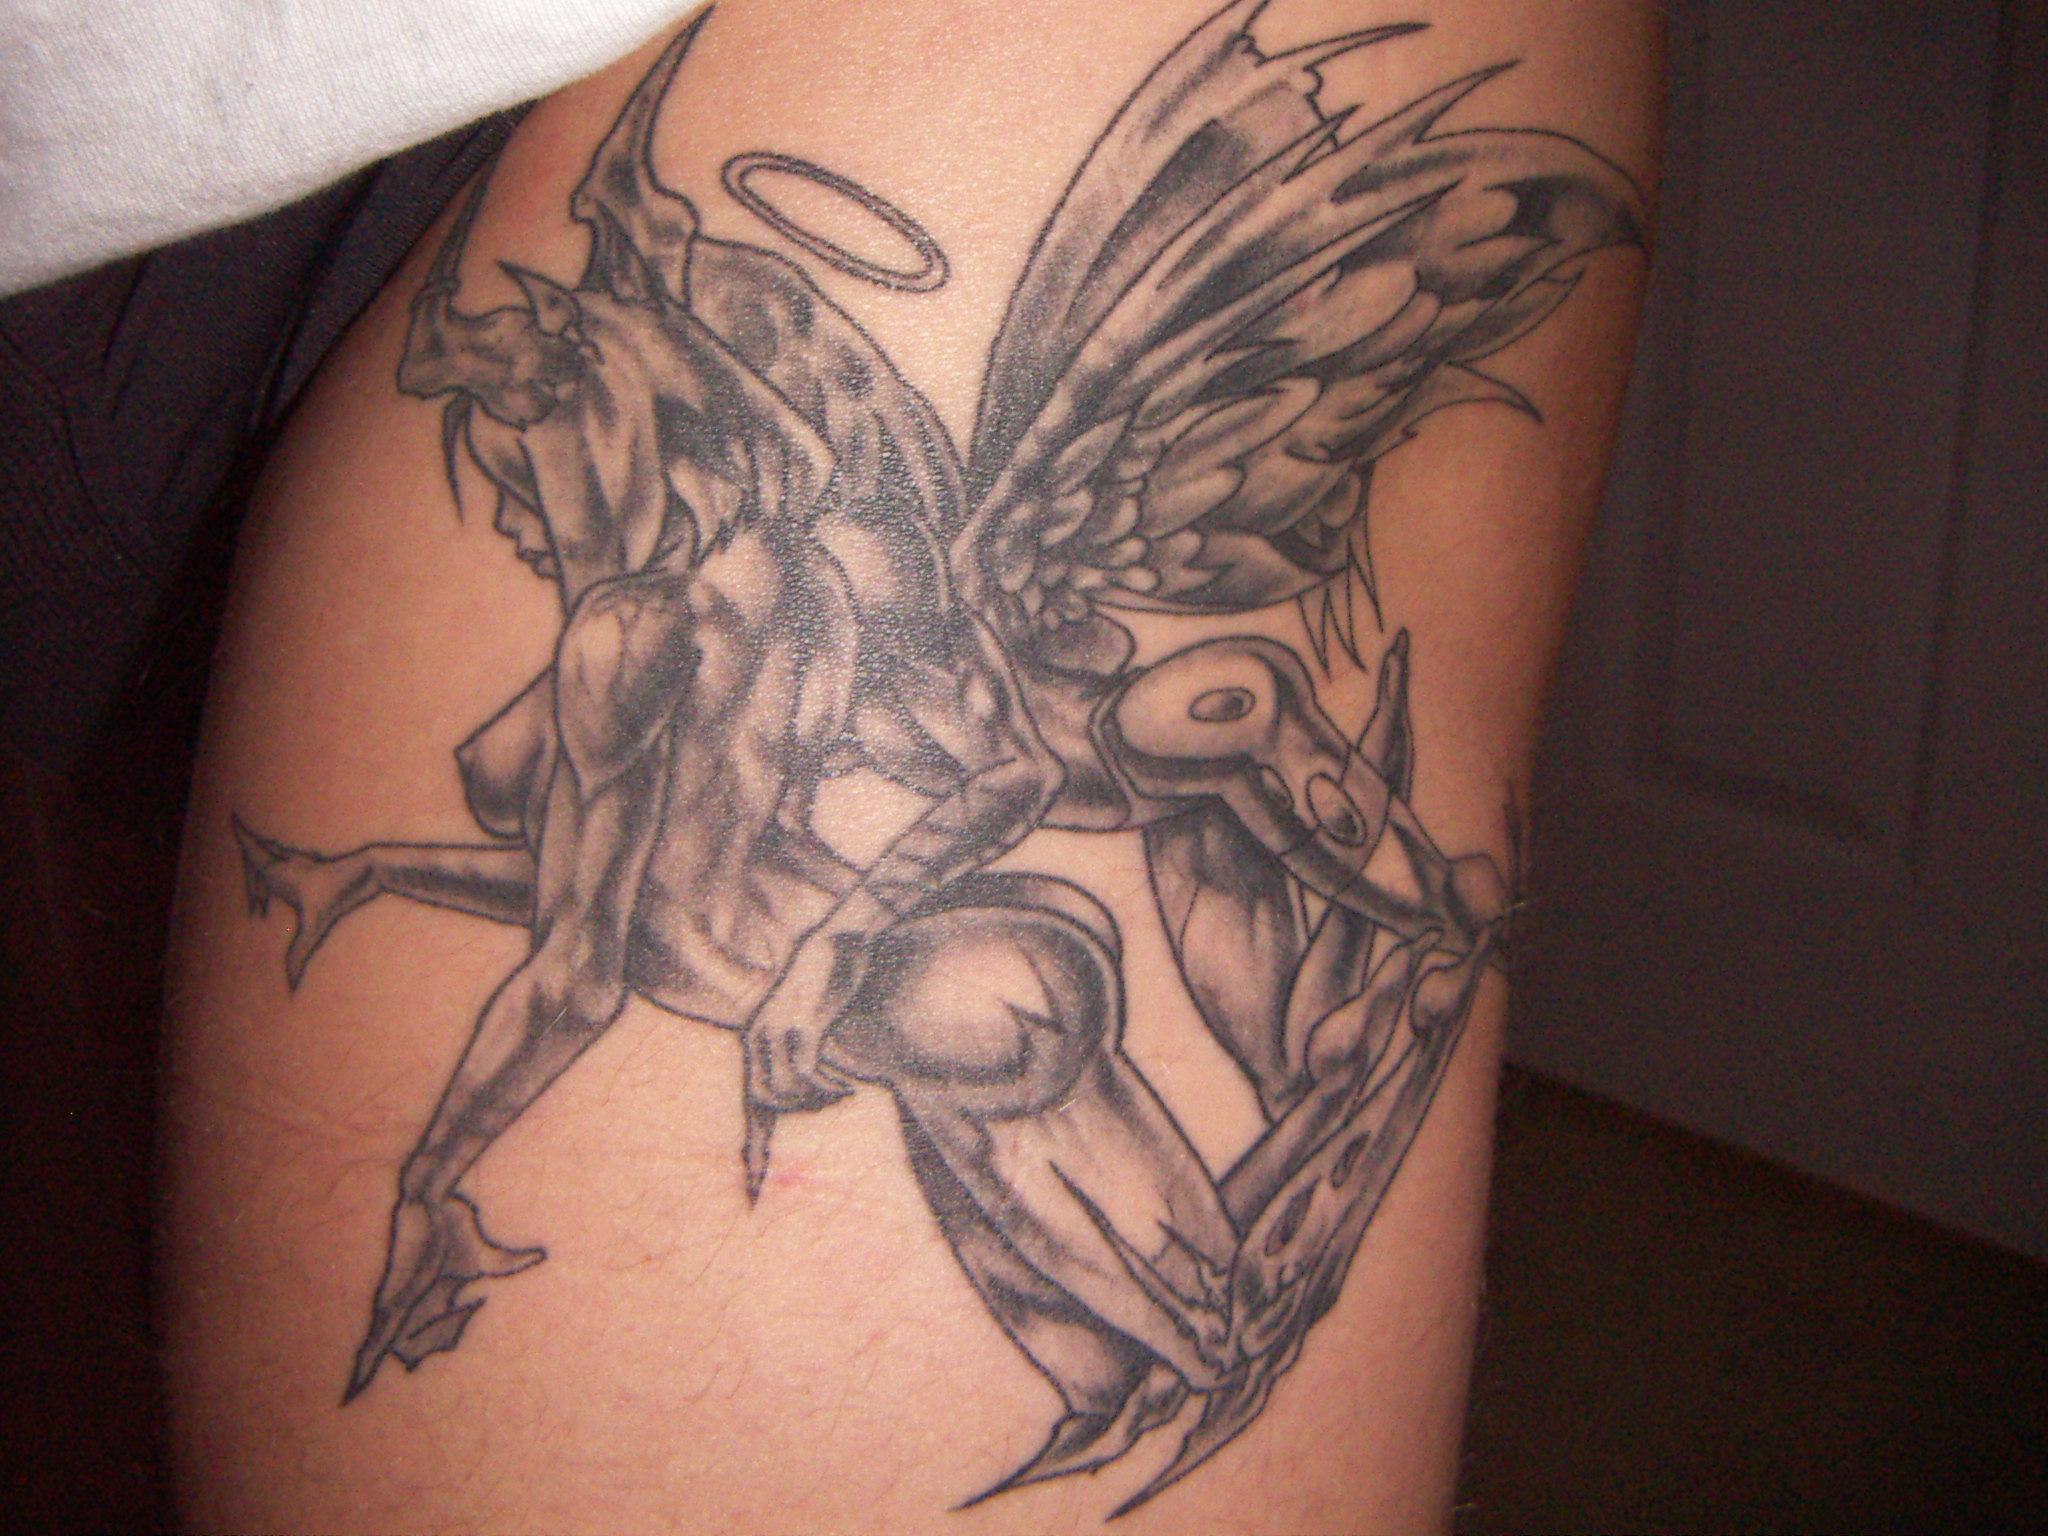 beautiful angel n devil tattoo design. Black Bedroom Furniture Sets. Home Design Ideas